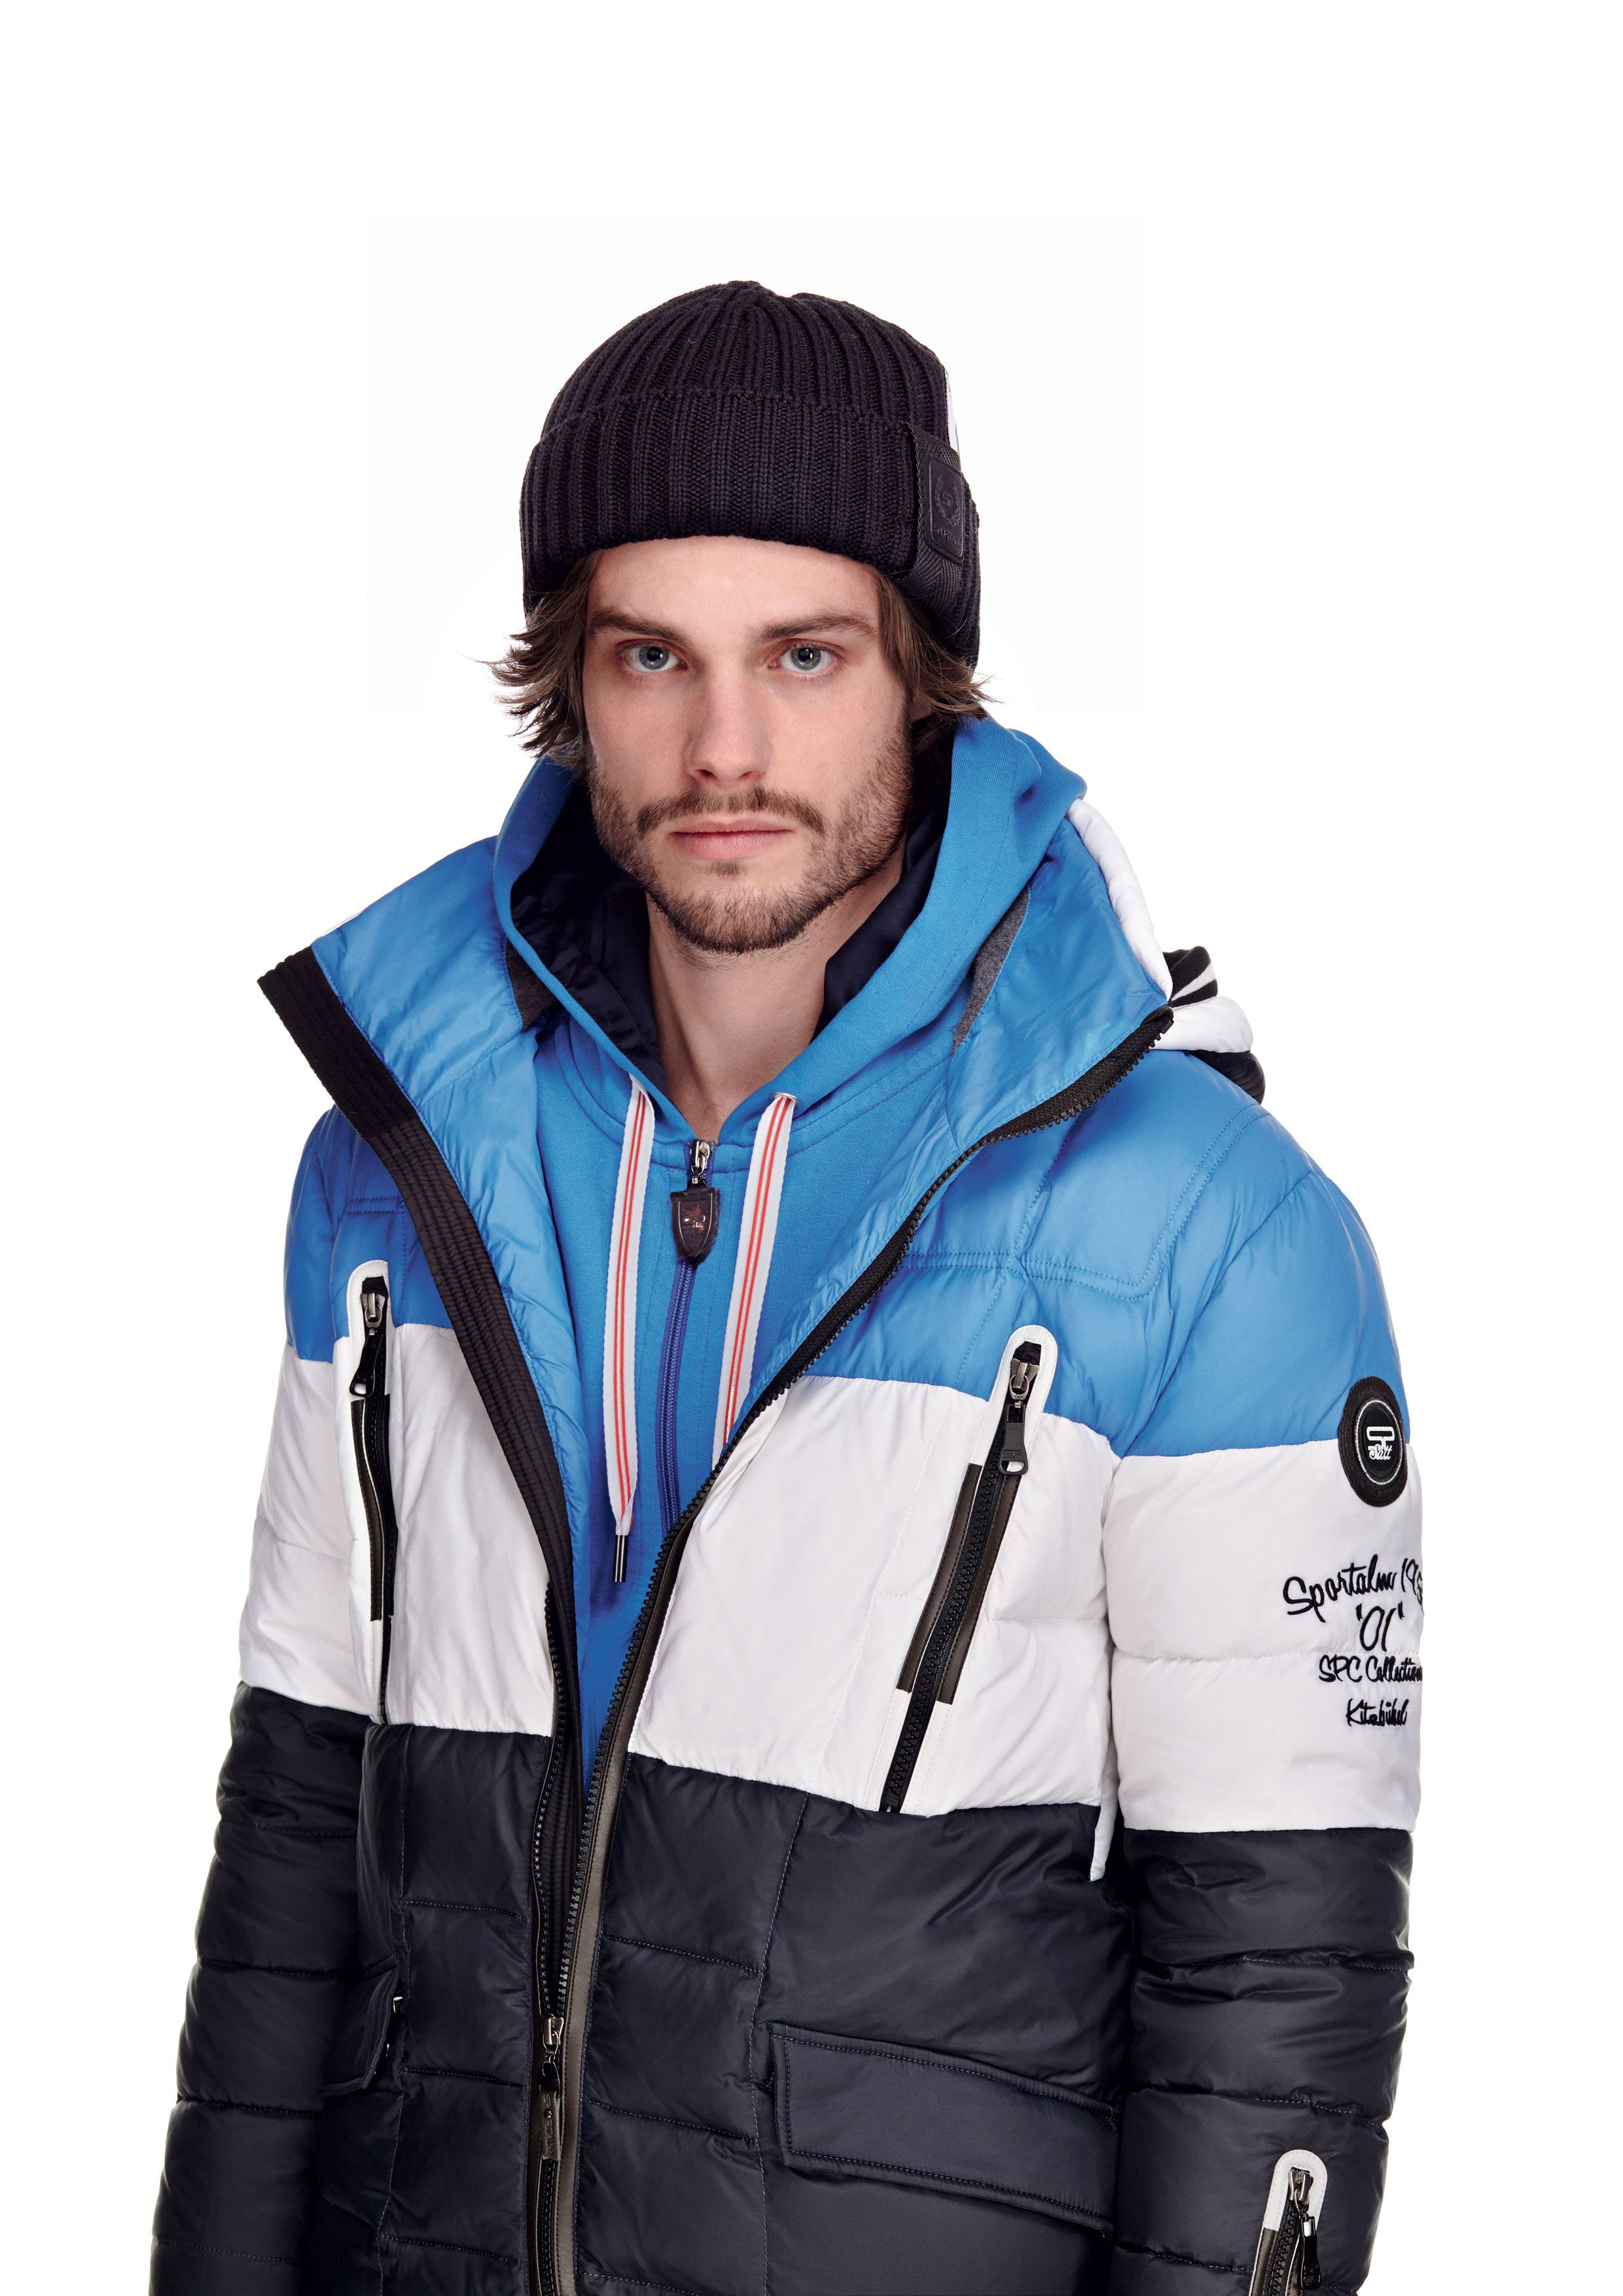 sportalm men 2013 2014 fashion ski mens skiwear pinterest ski wear mens skis and style men. Black Bedroom Furniture Sets. Home Design Ideas